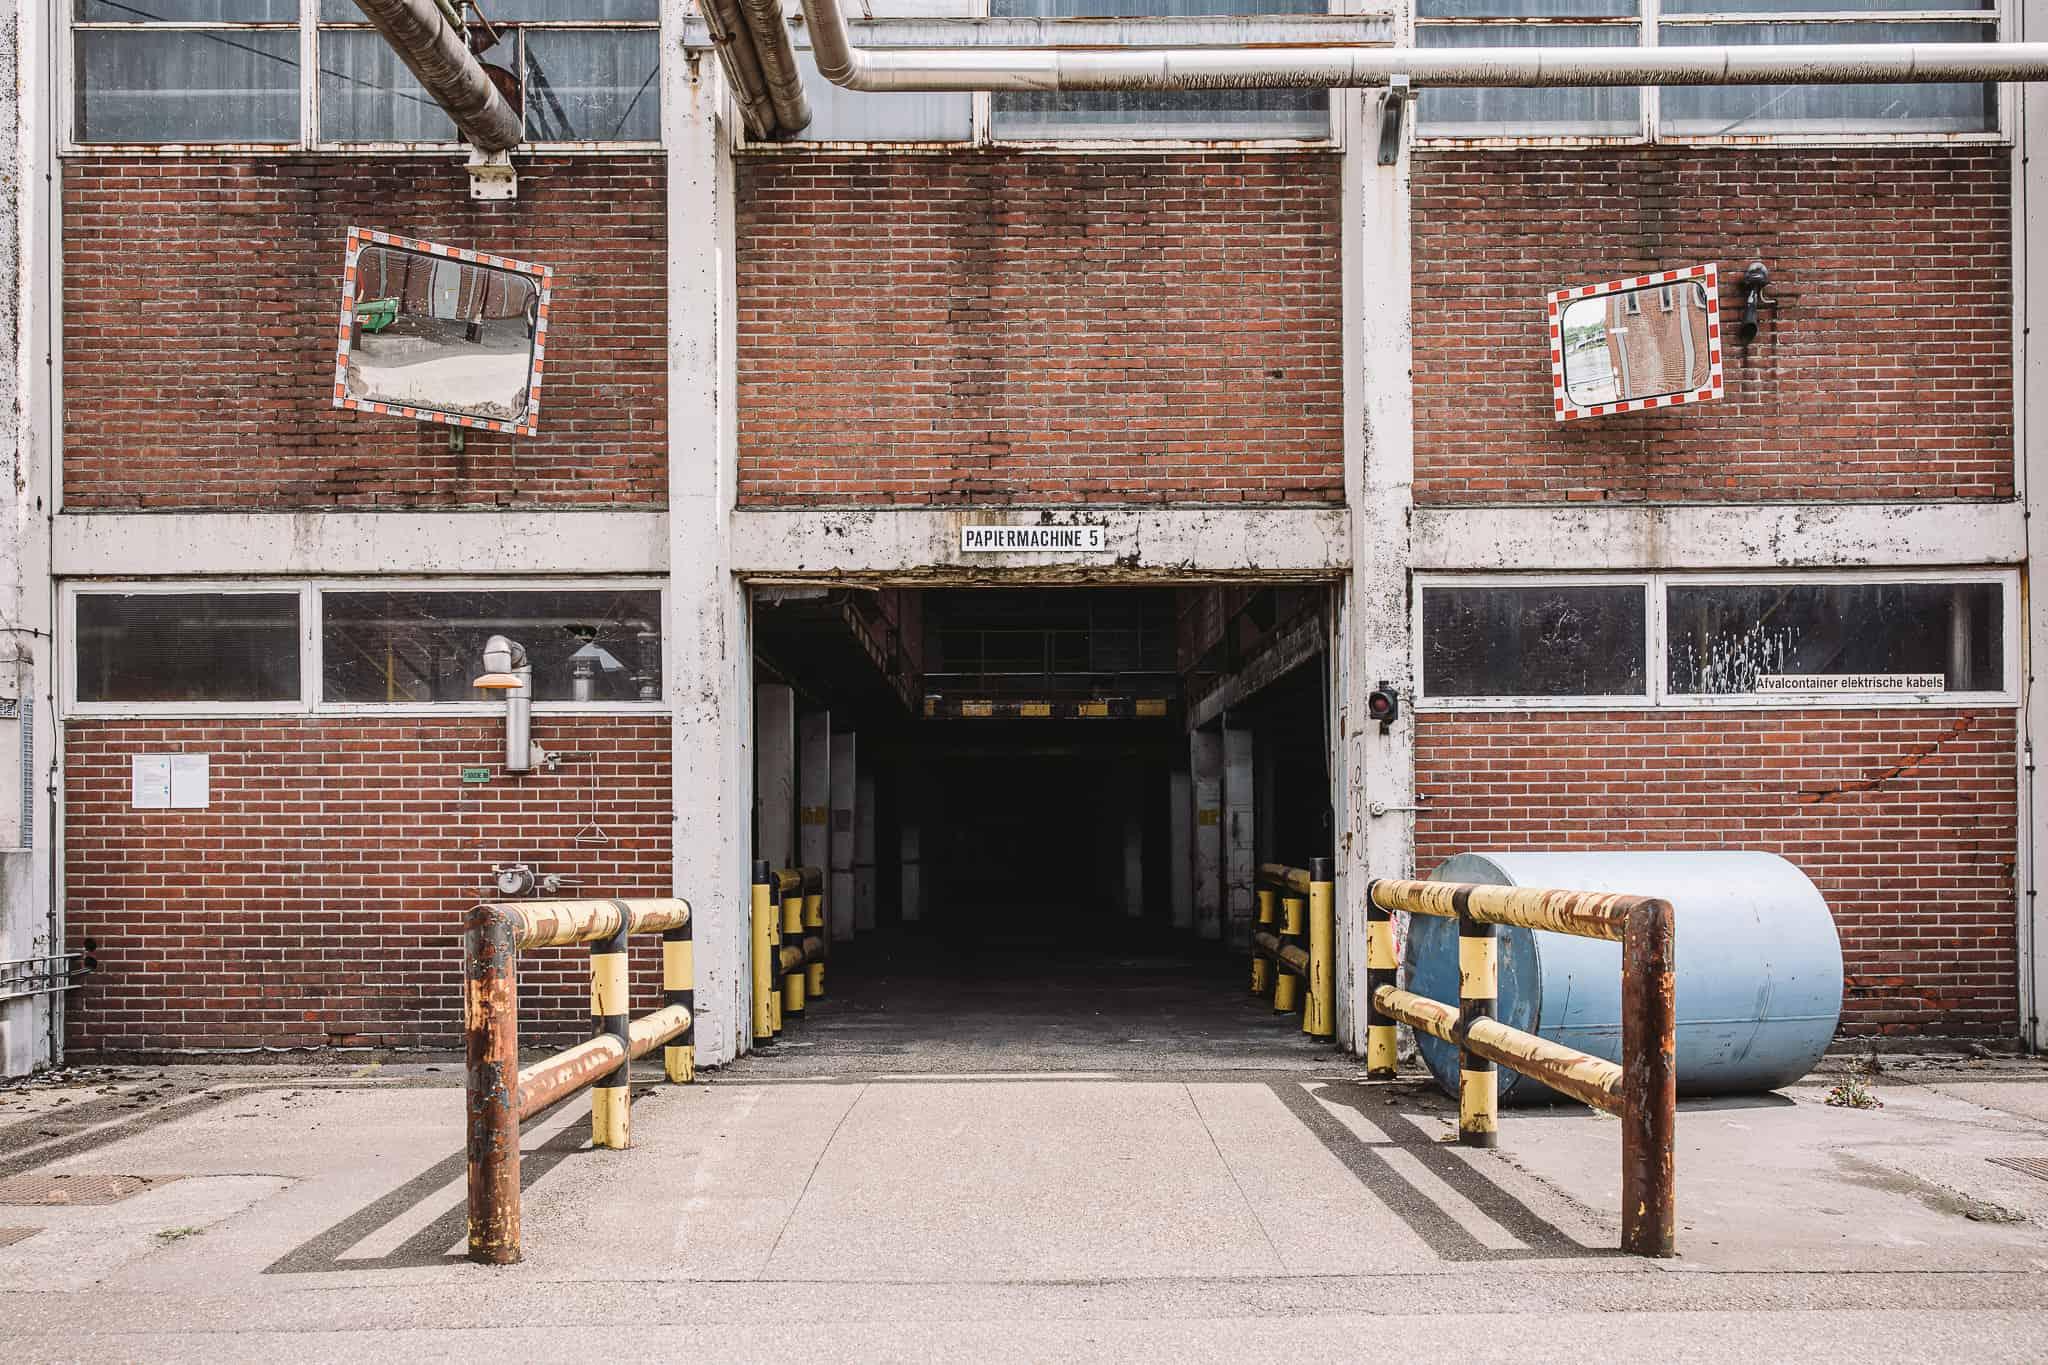 EKI_Nijmegen_03 - papierfabriek - industreel - locatie